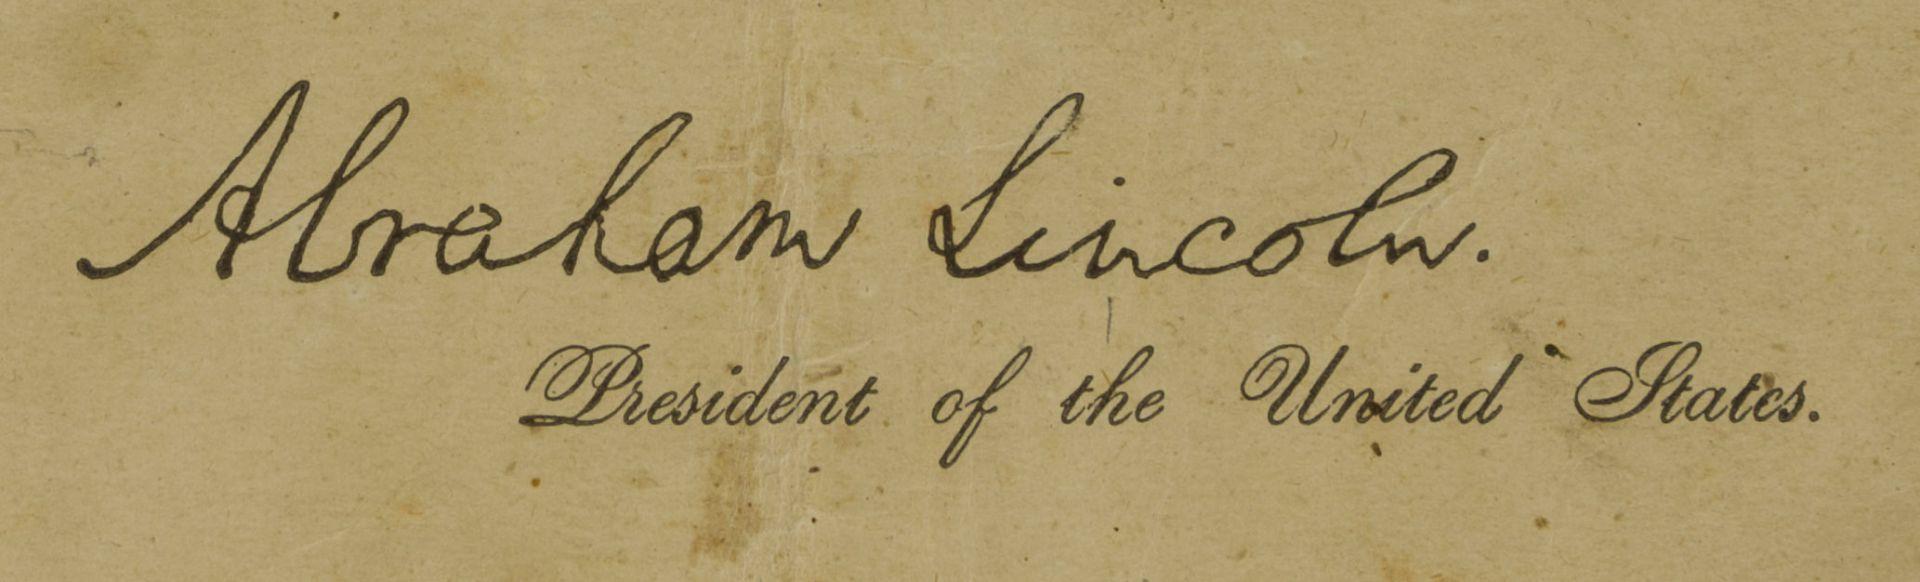 Lot 232 Civil War Certificate Of Honorable Discharge Leonard